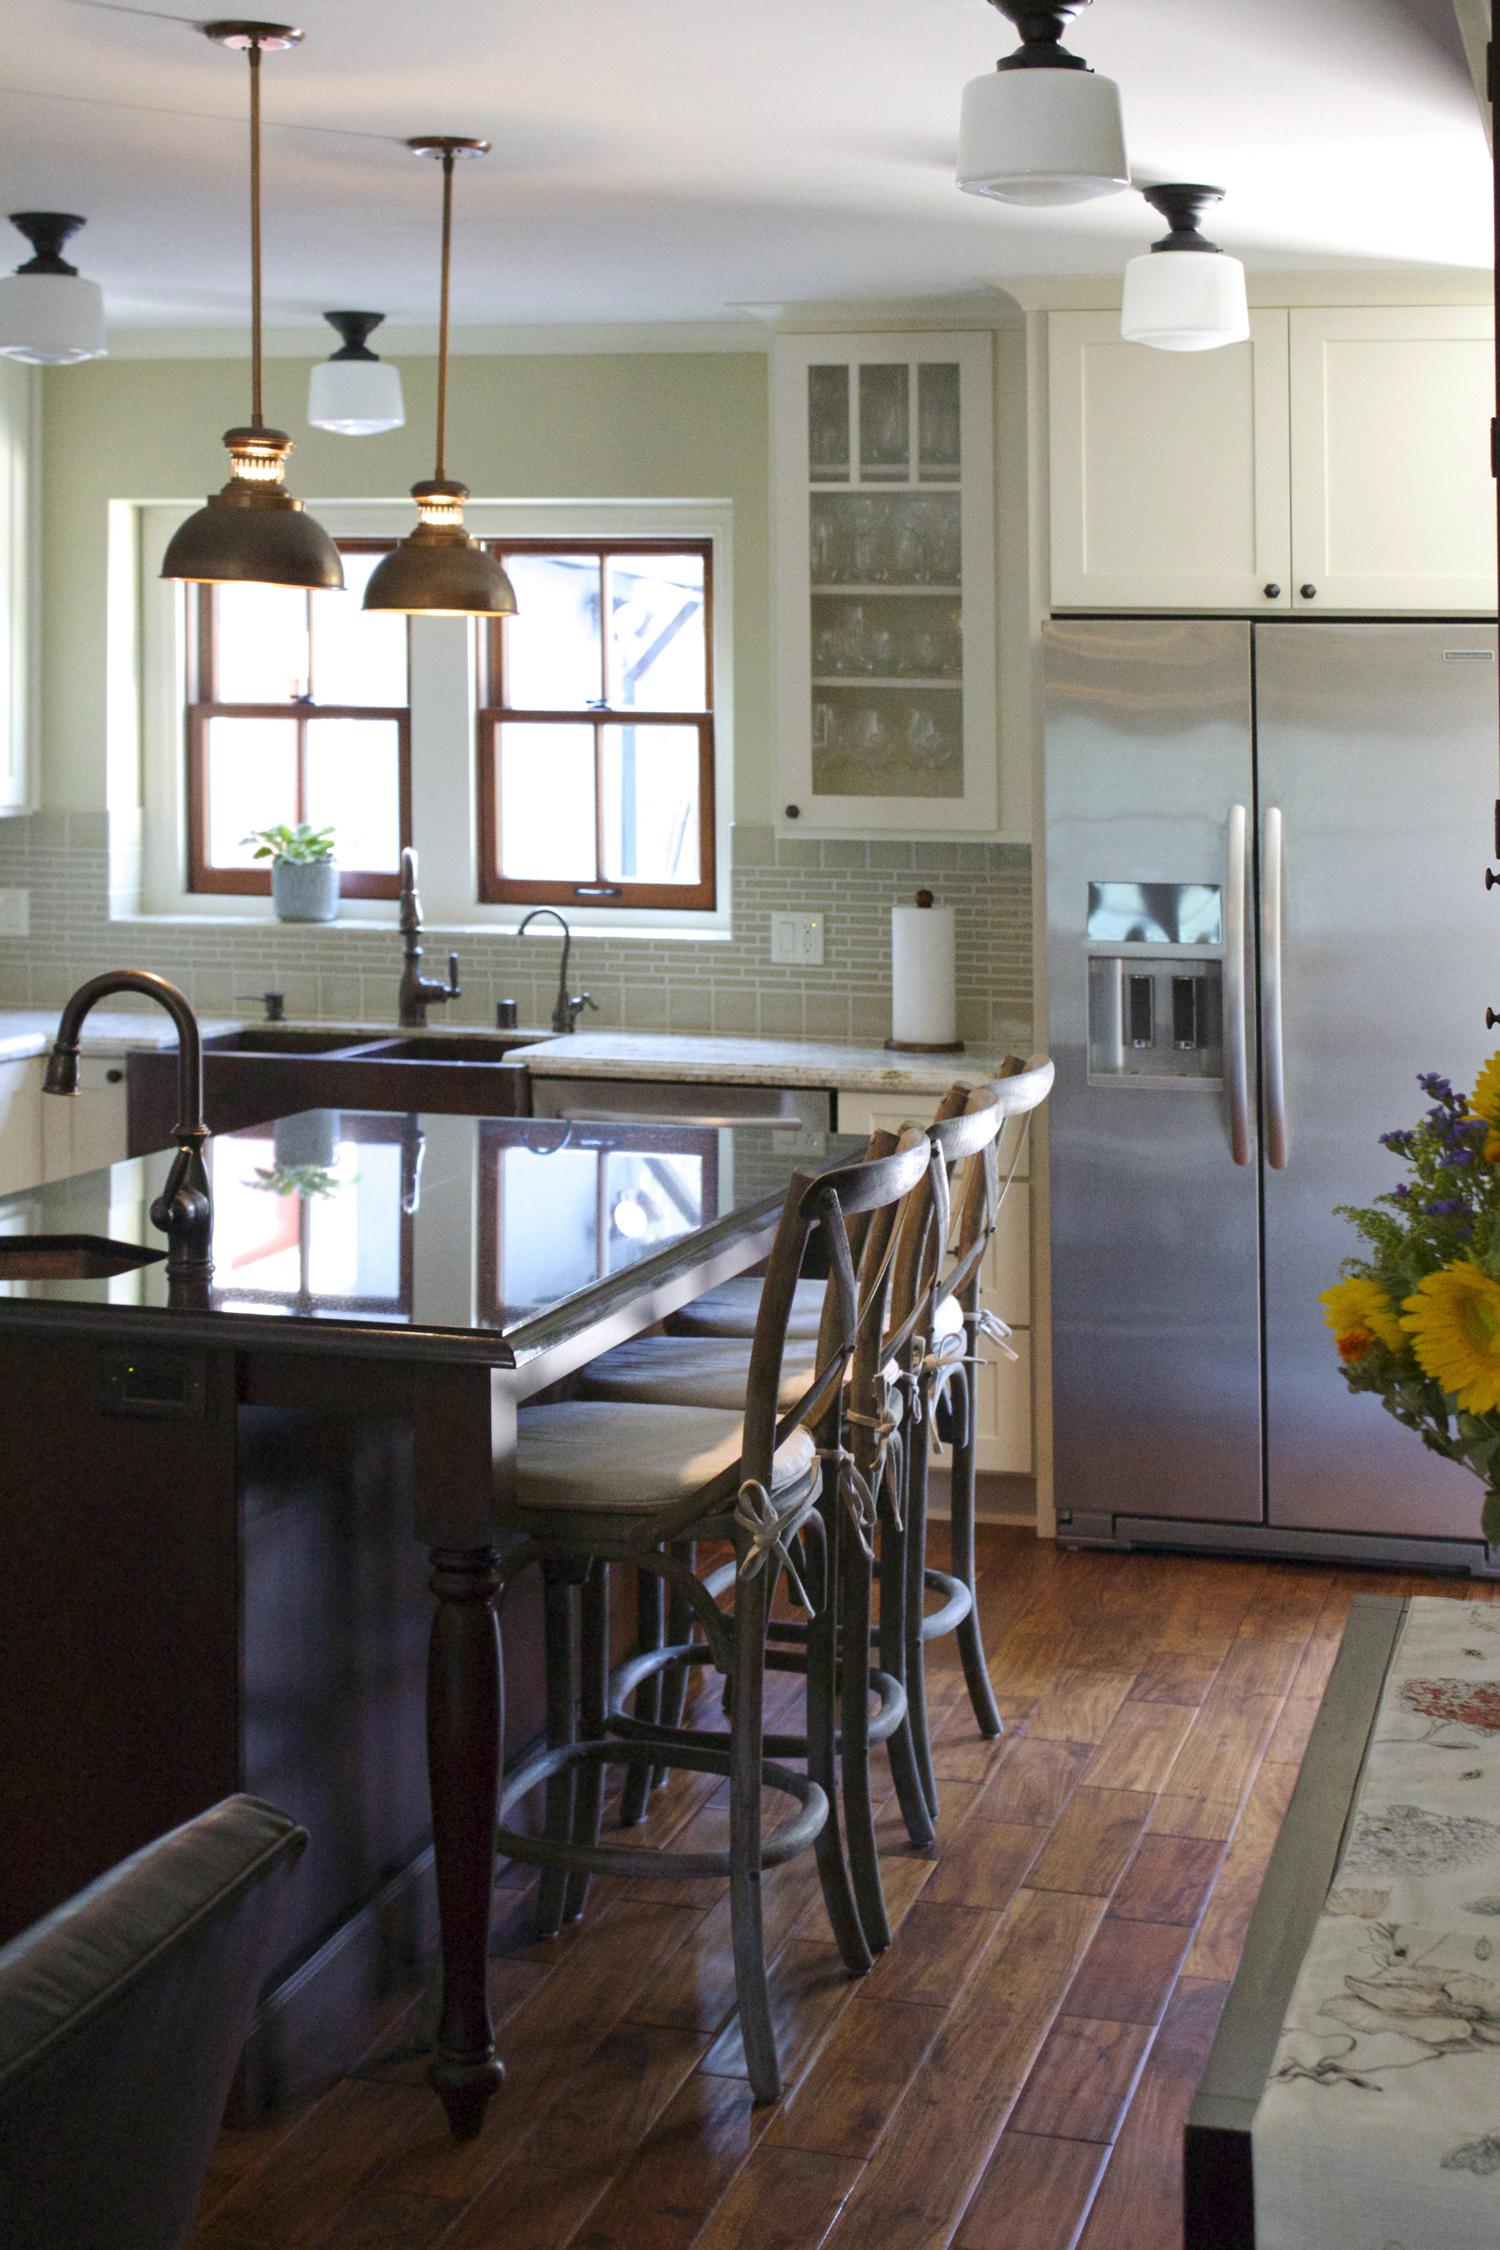 kitchen1small.jpg